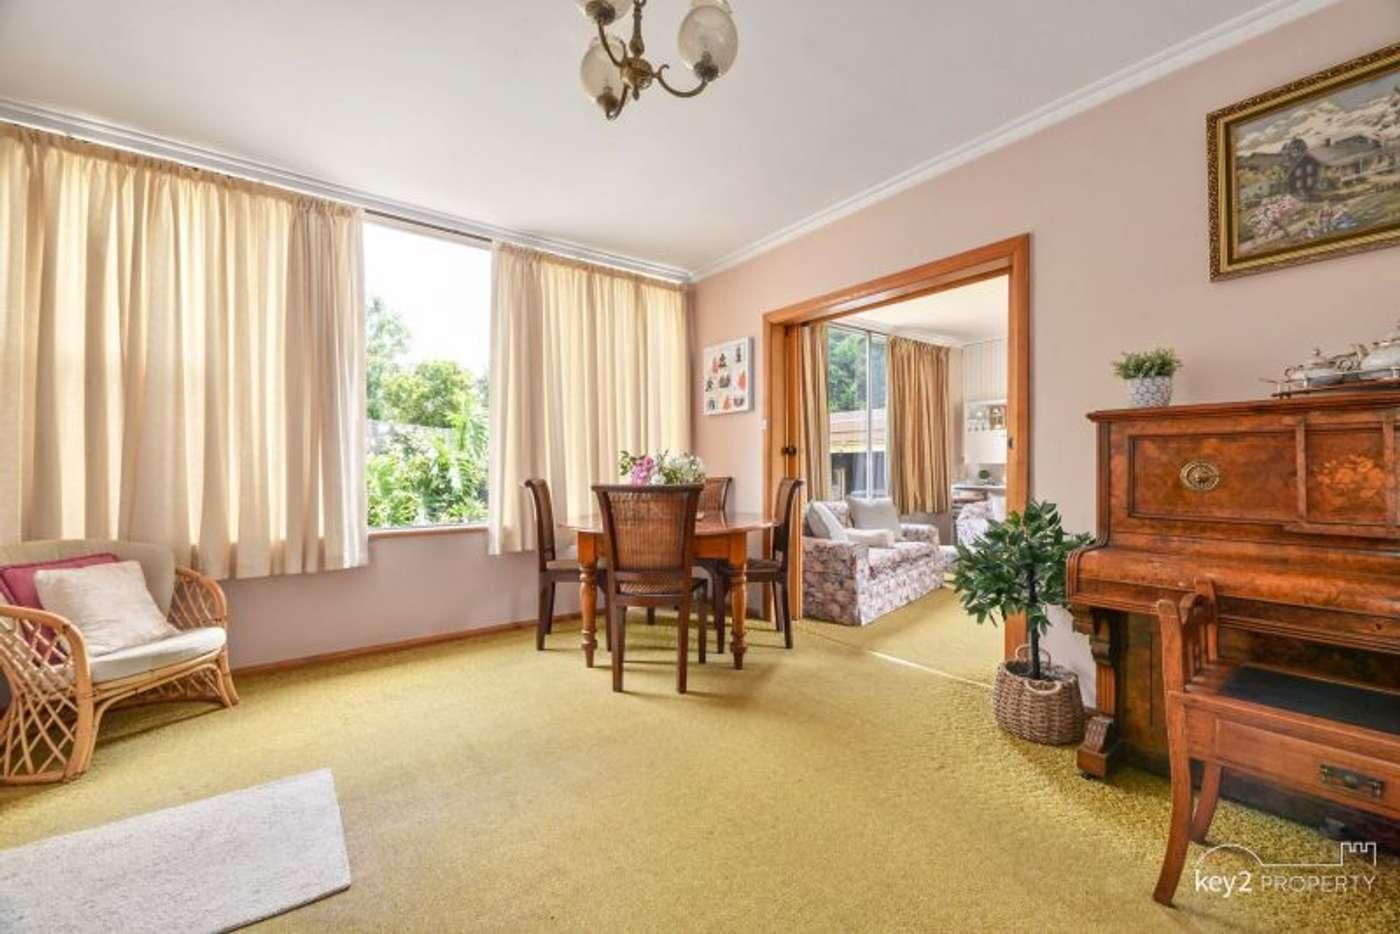 Fifth view of Homely house listing, 116 Peel Street West, West Launceston TAS 7250